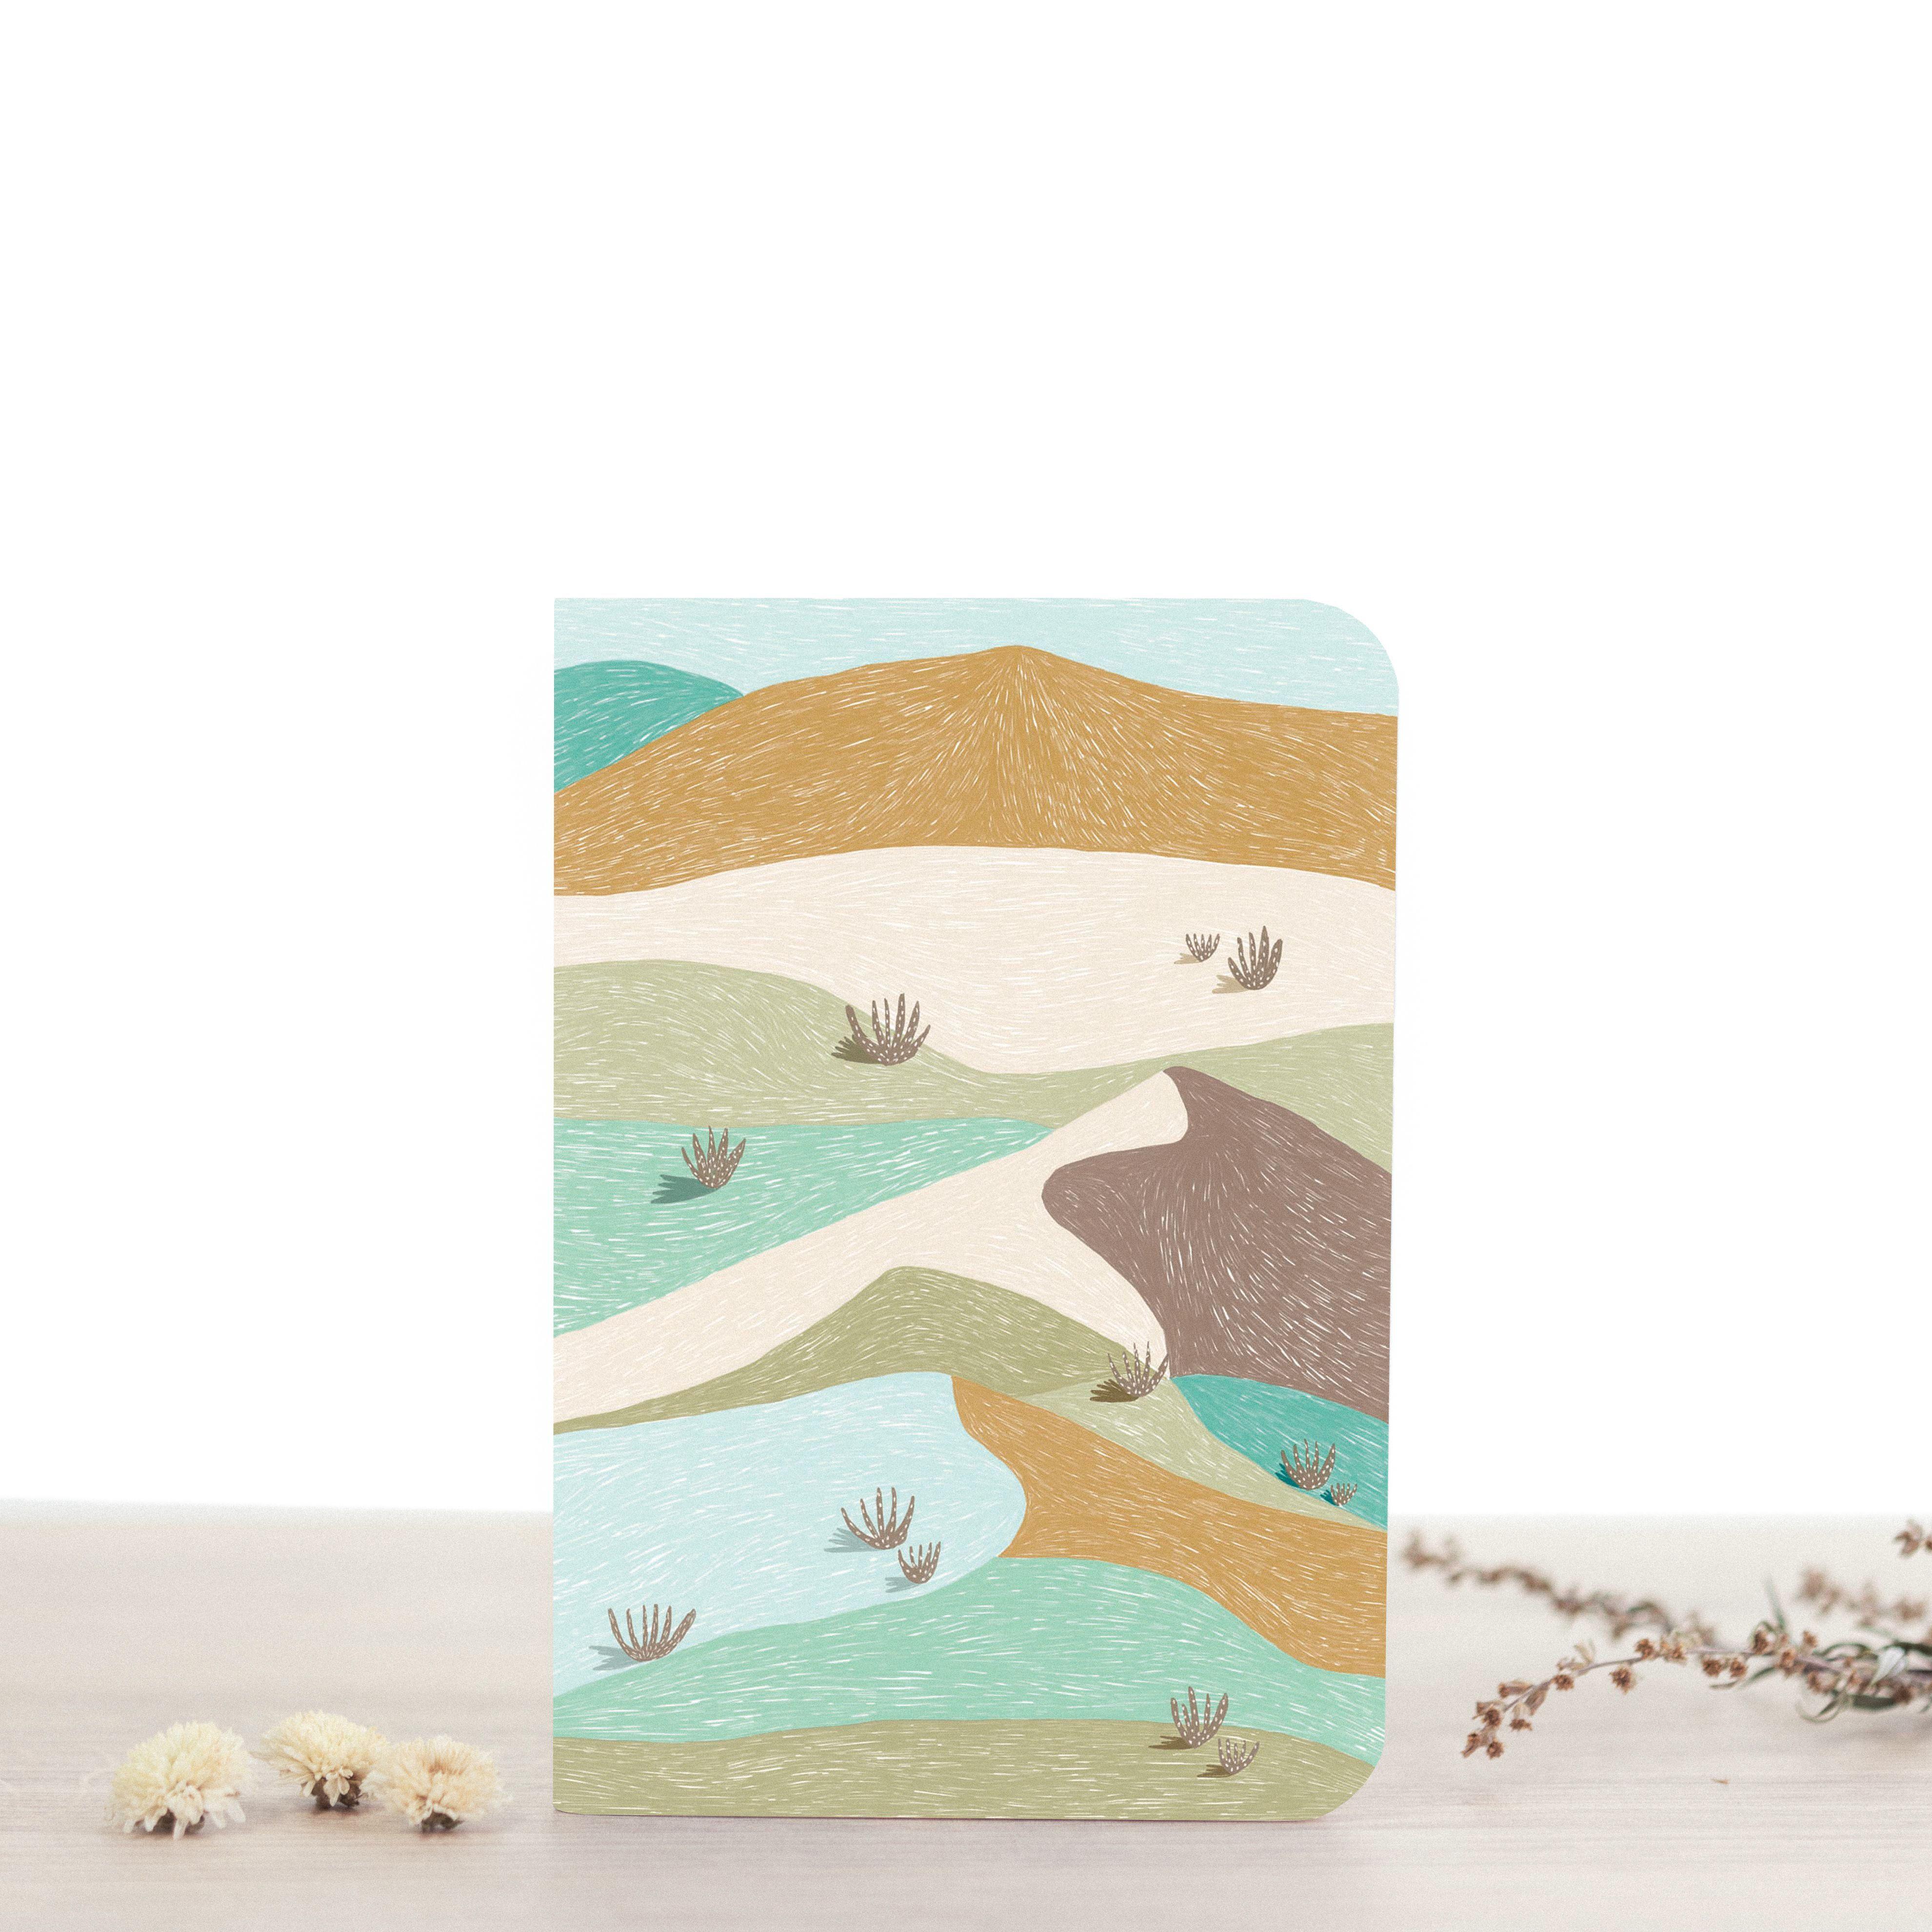 Atelier Bobbie A6 Notebook - Garance - Blank